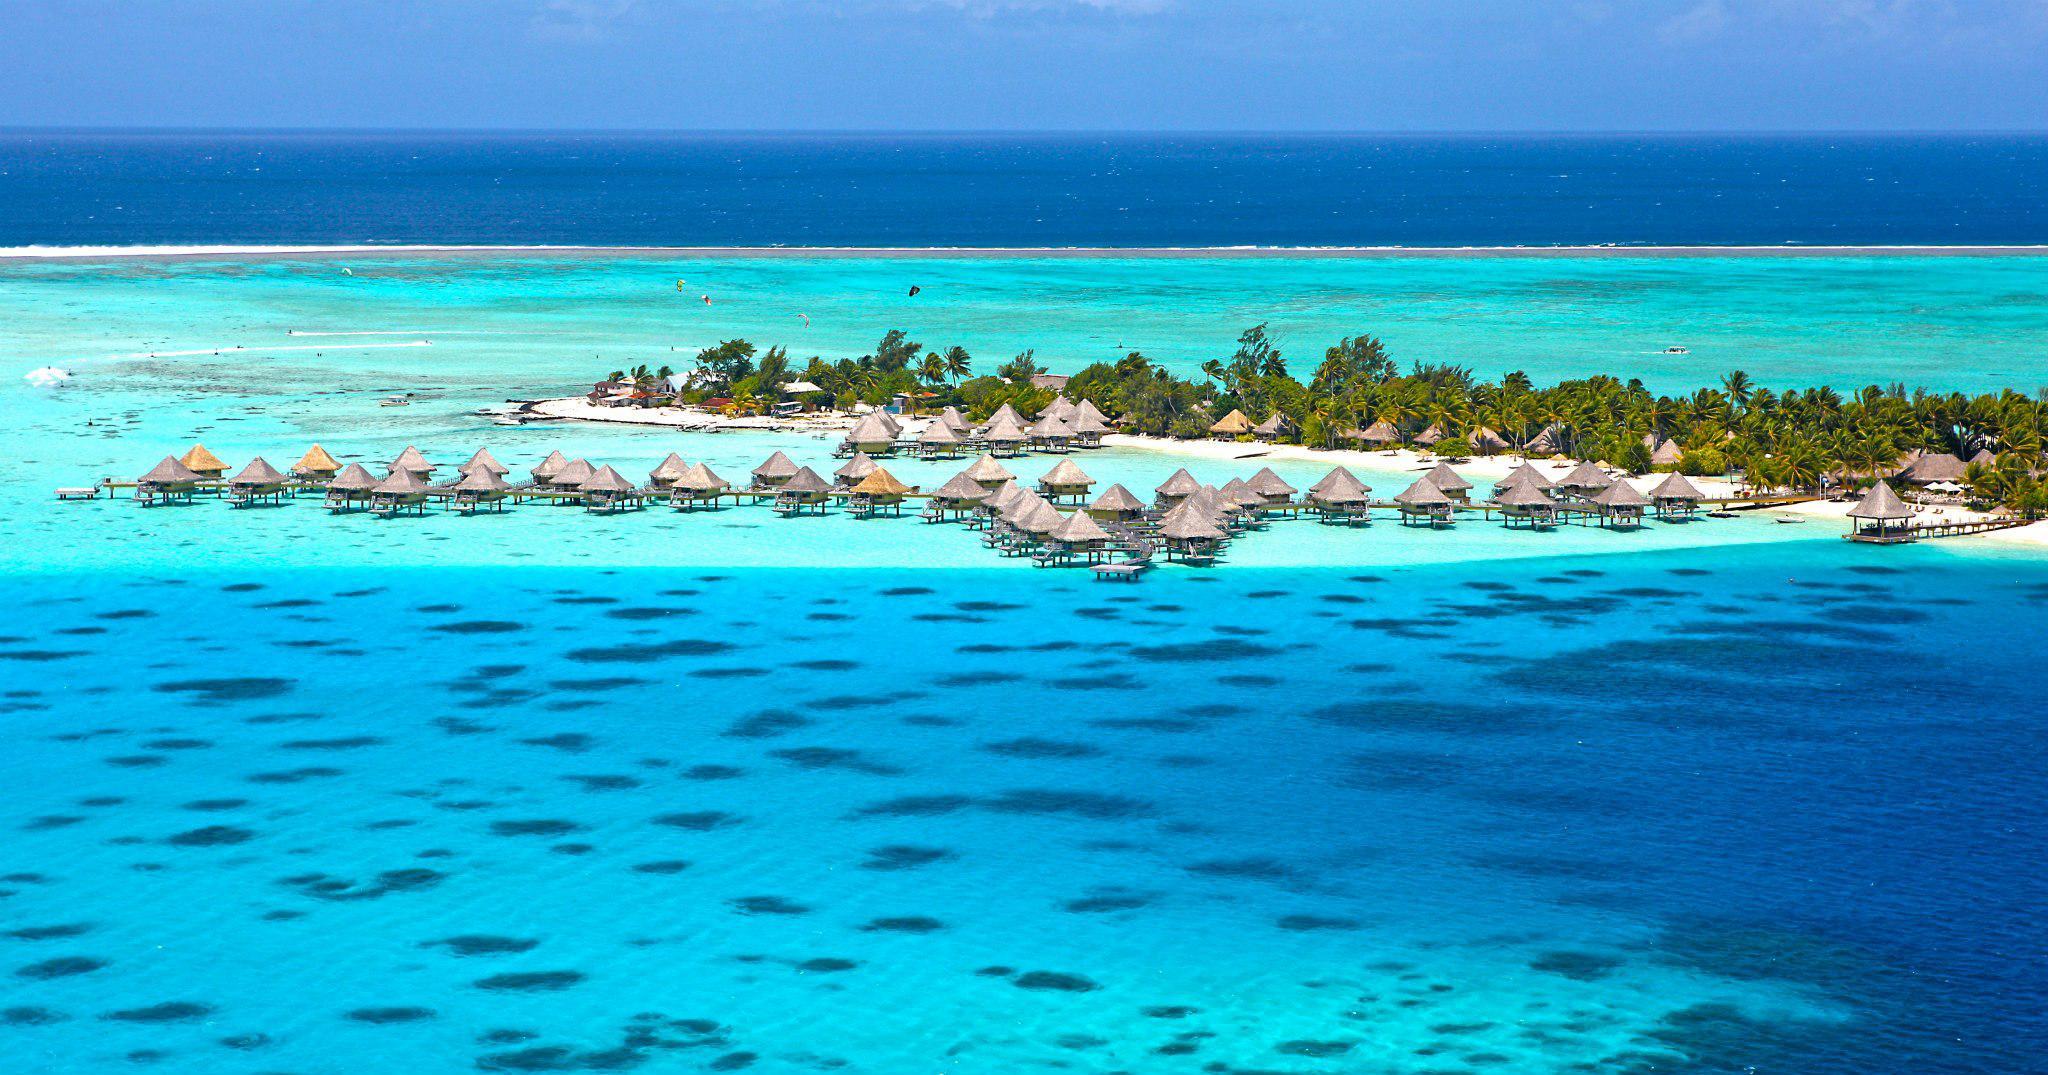 Lagoon Tropical Island: Tropical Lagoon Wallpaper